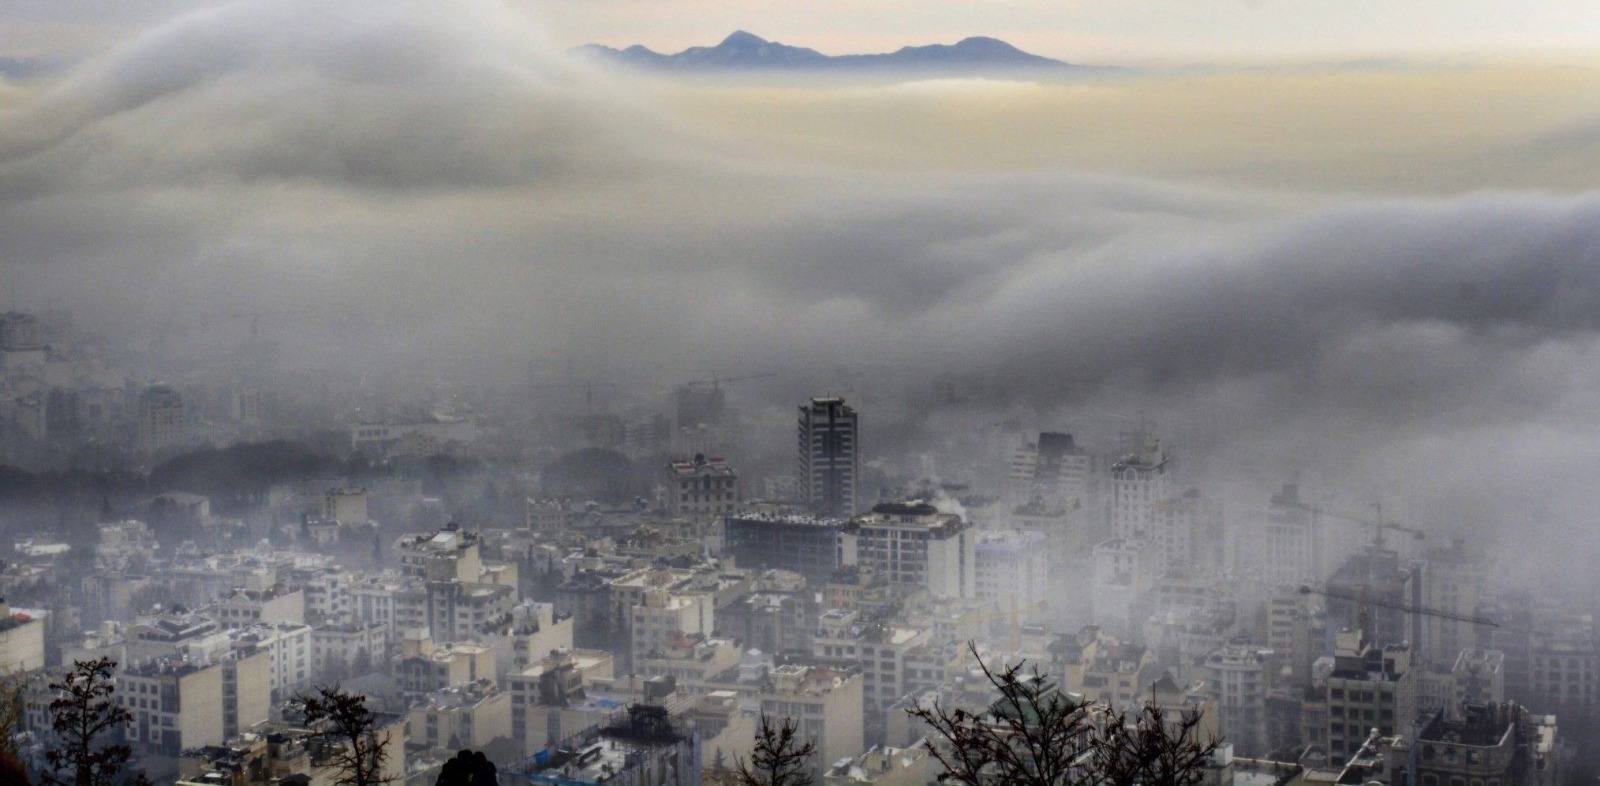 wolken teheran WMO Seyed Amin Habibi ccbyncnd20 cropped